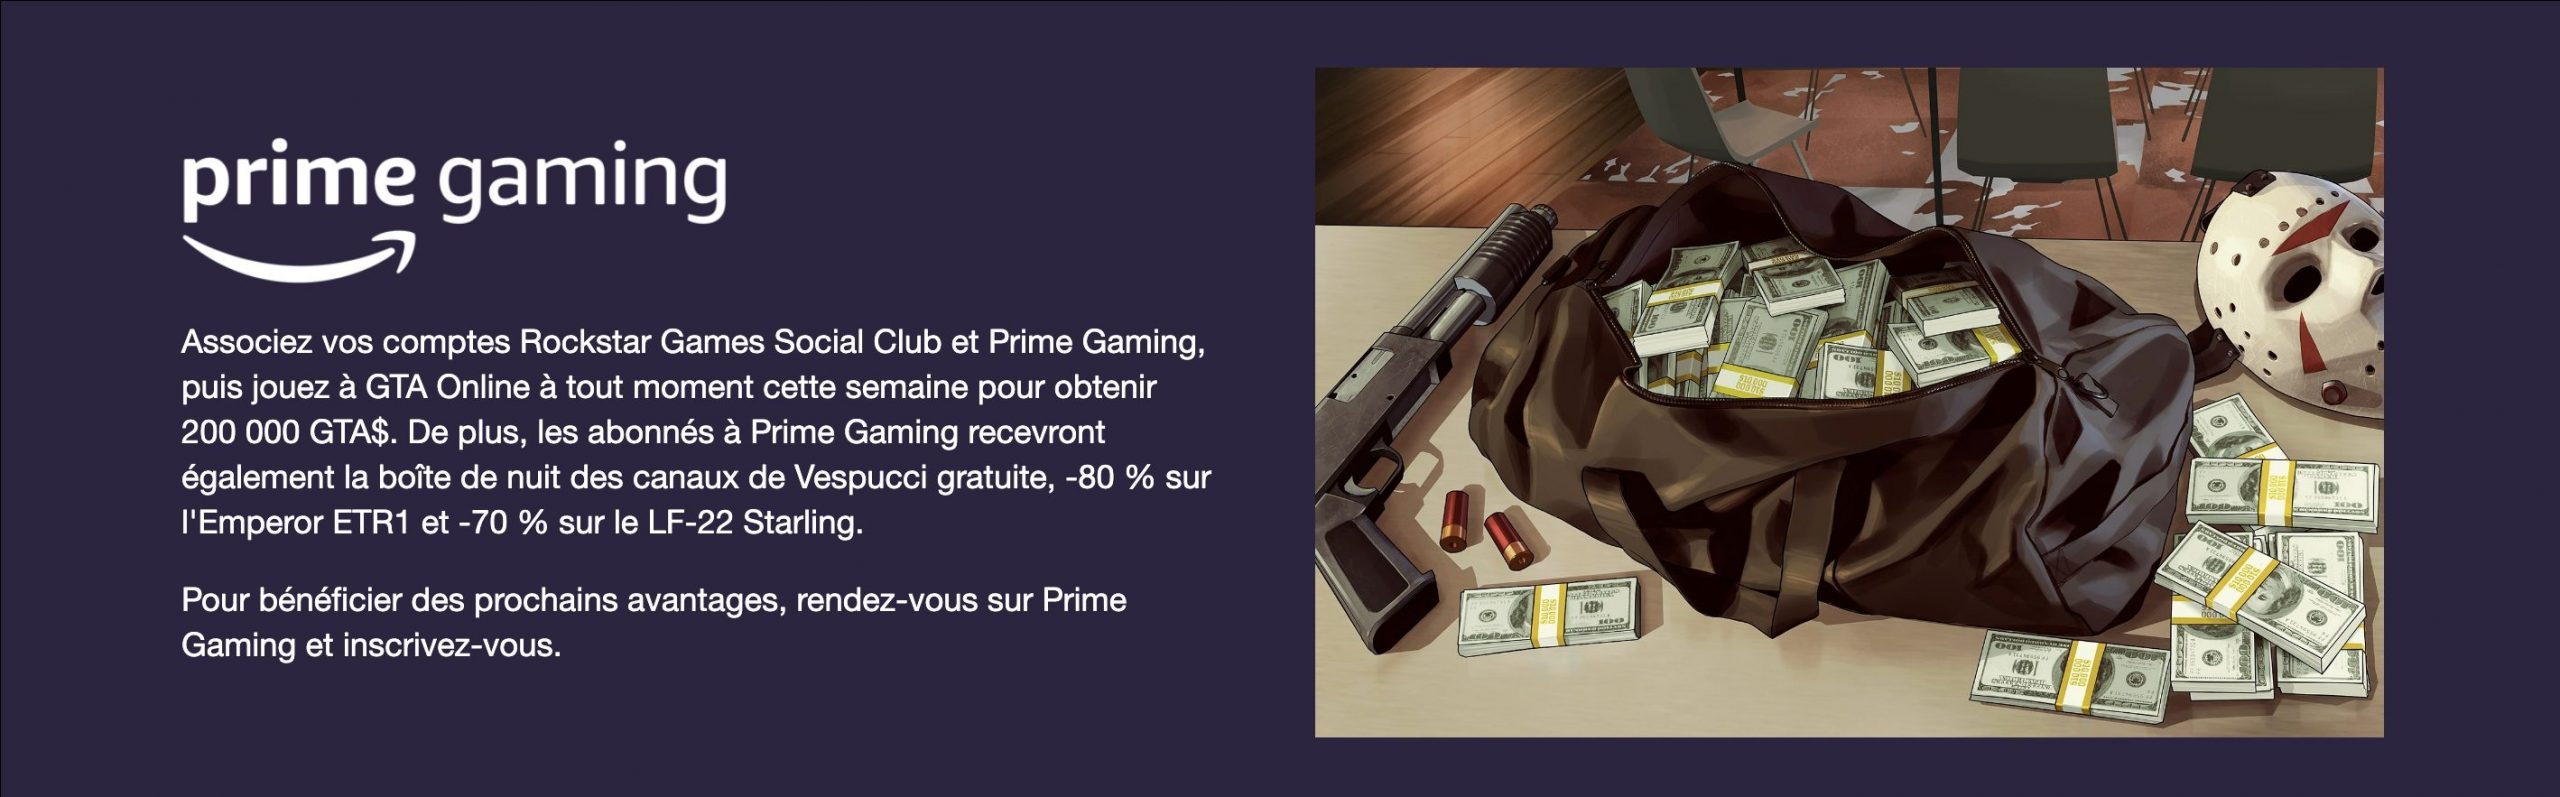 Prime Gaming GTA Online 5 Novembre